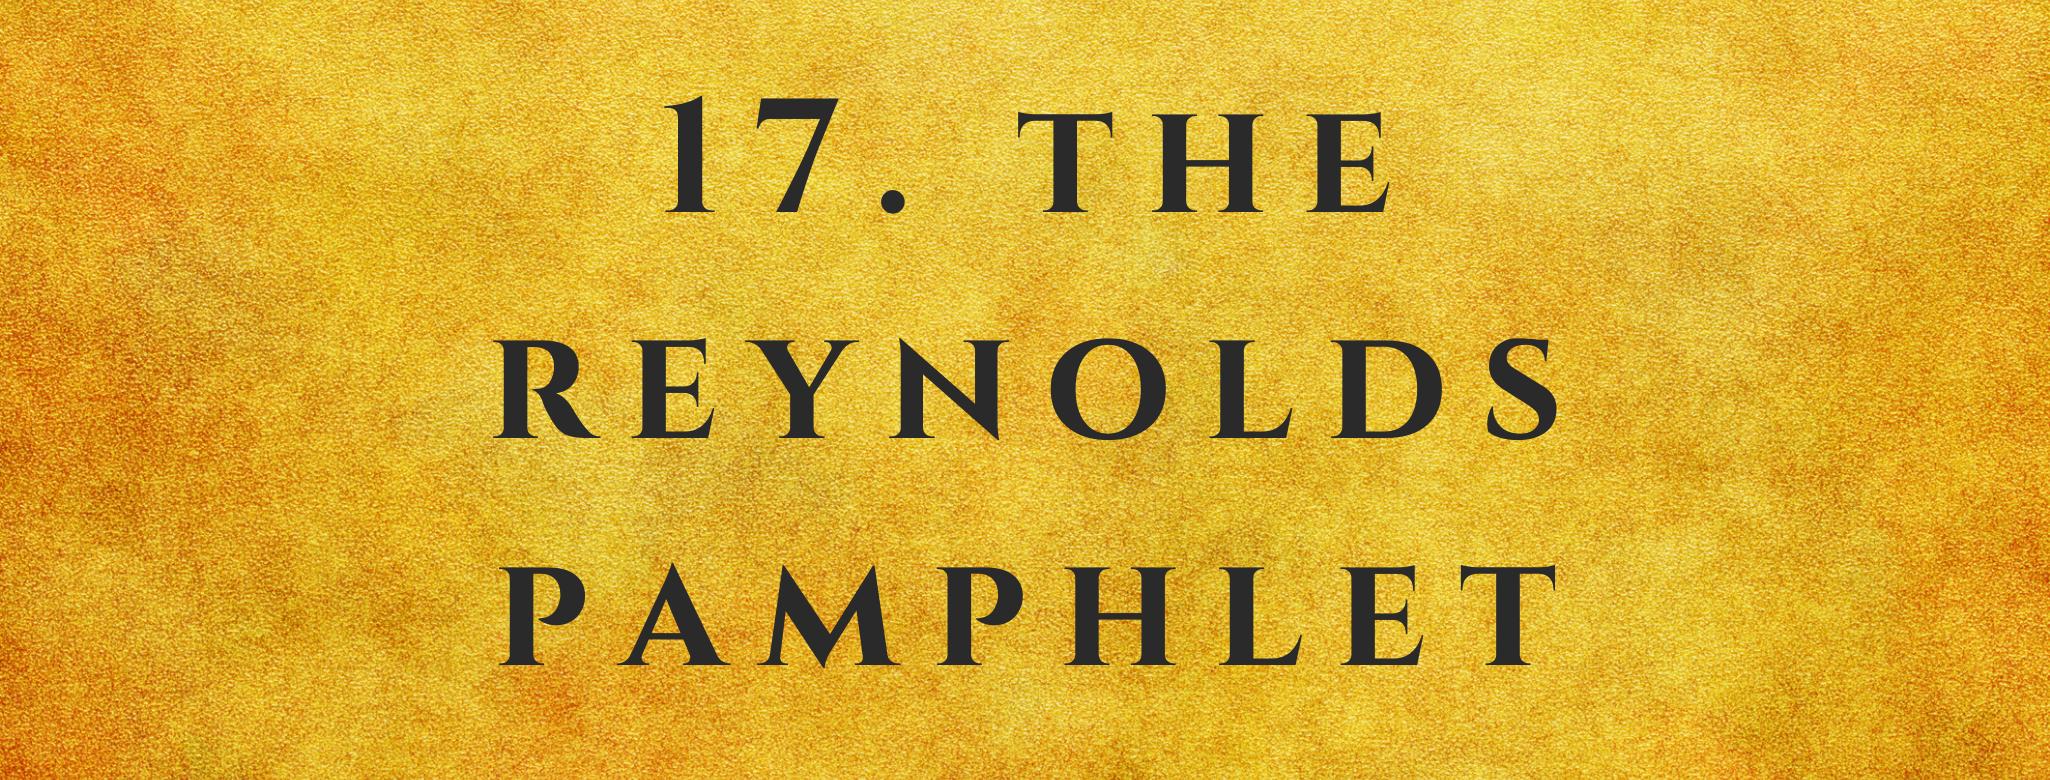 #17 The Reynolds Pamphlet